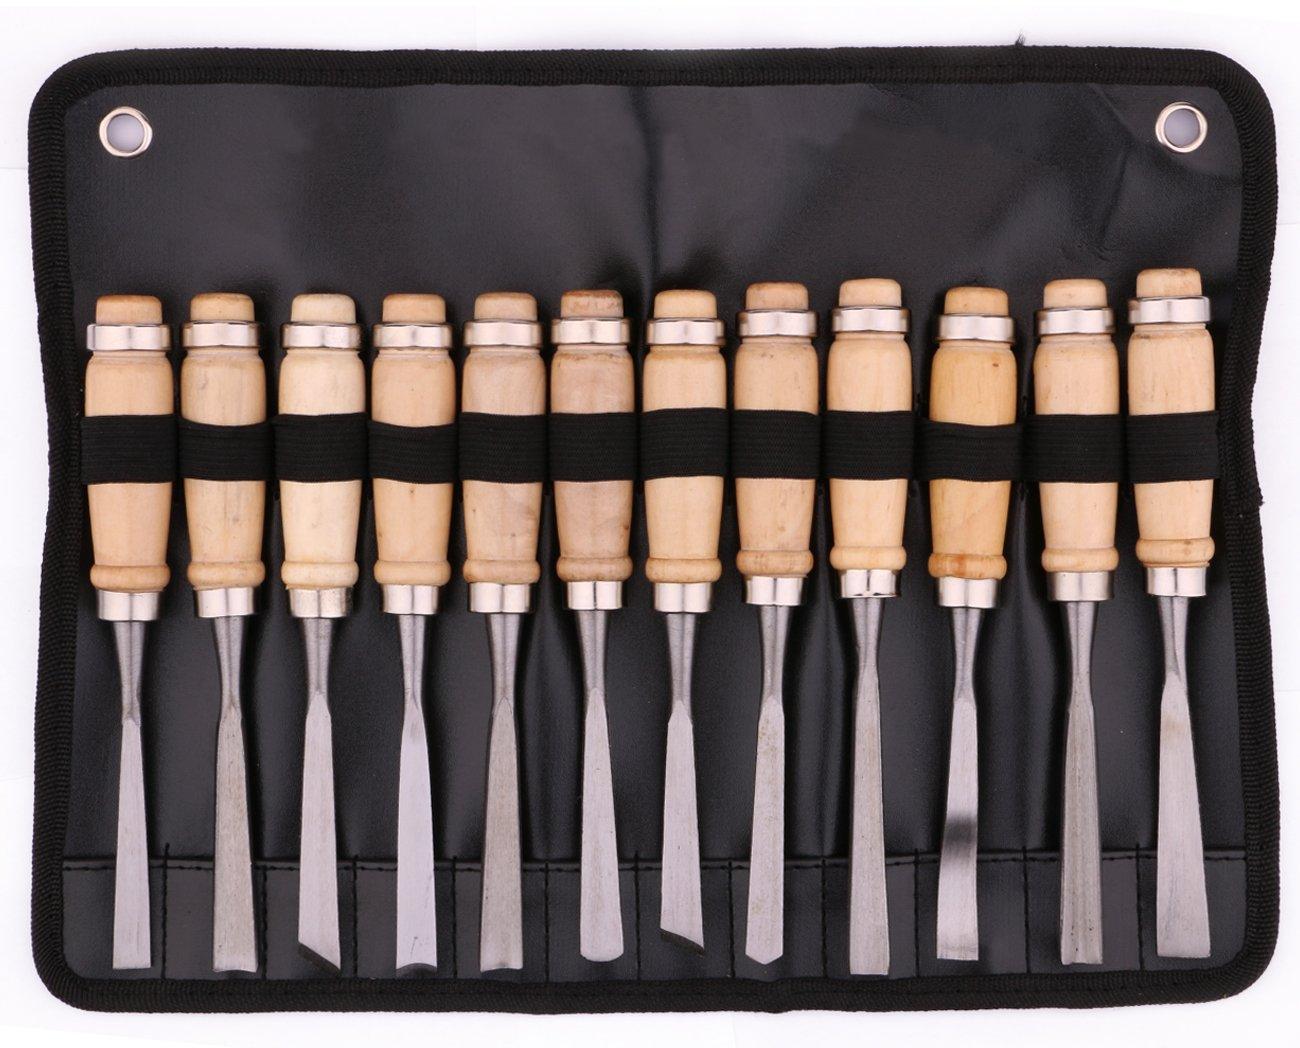 Professional 12 Piece Wood Carving Chisel Set, kattool Wood Carving Tools,Carving Kit with Carrying Case 4336912263